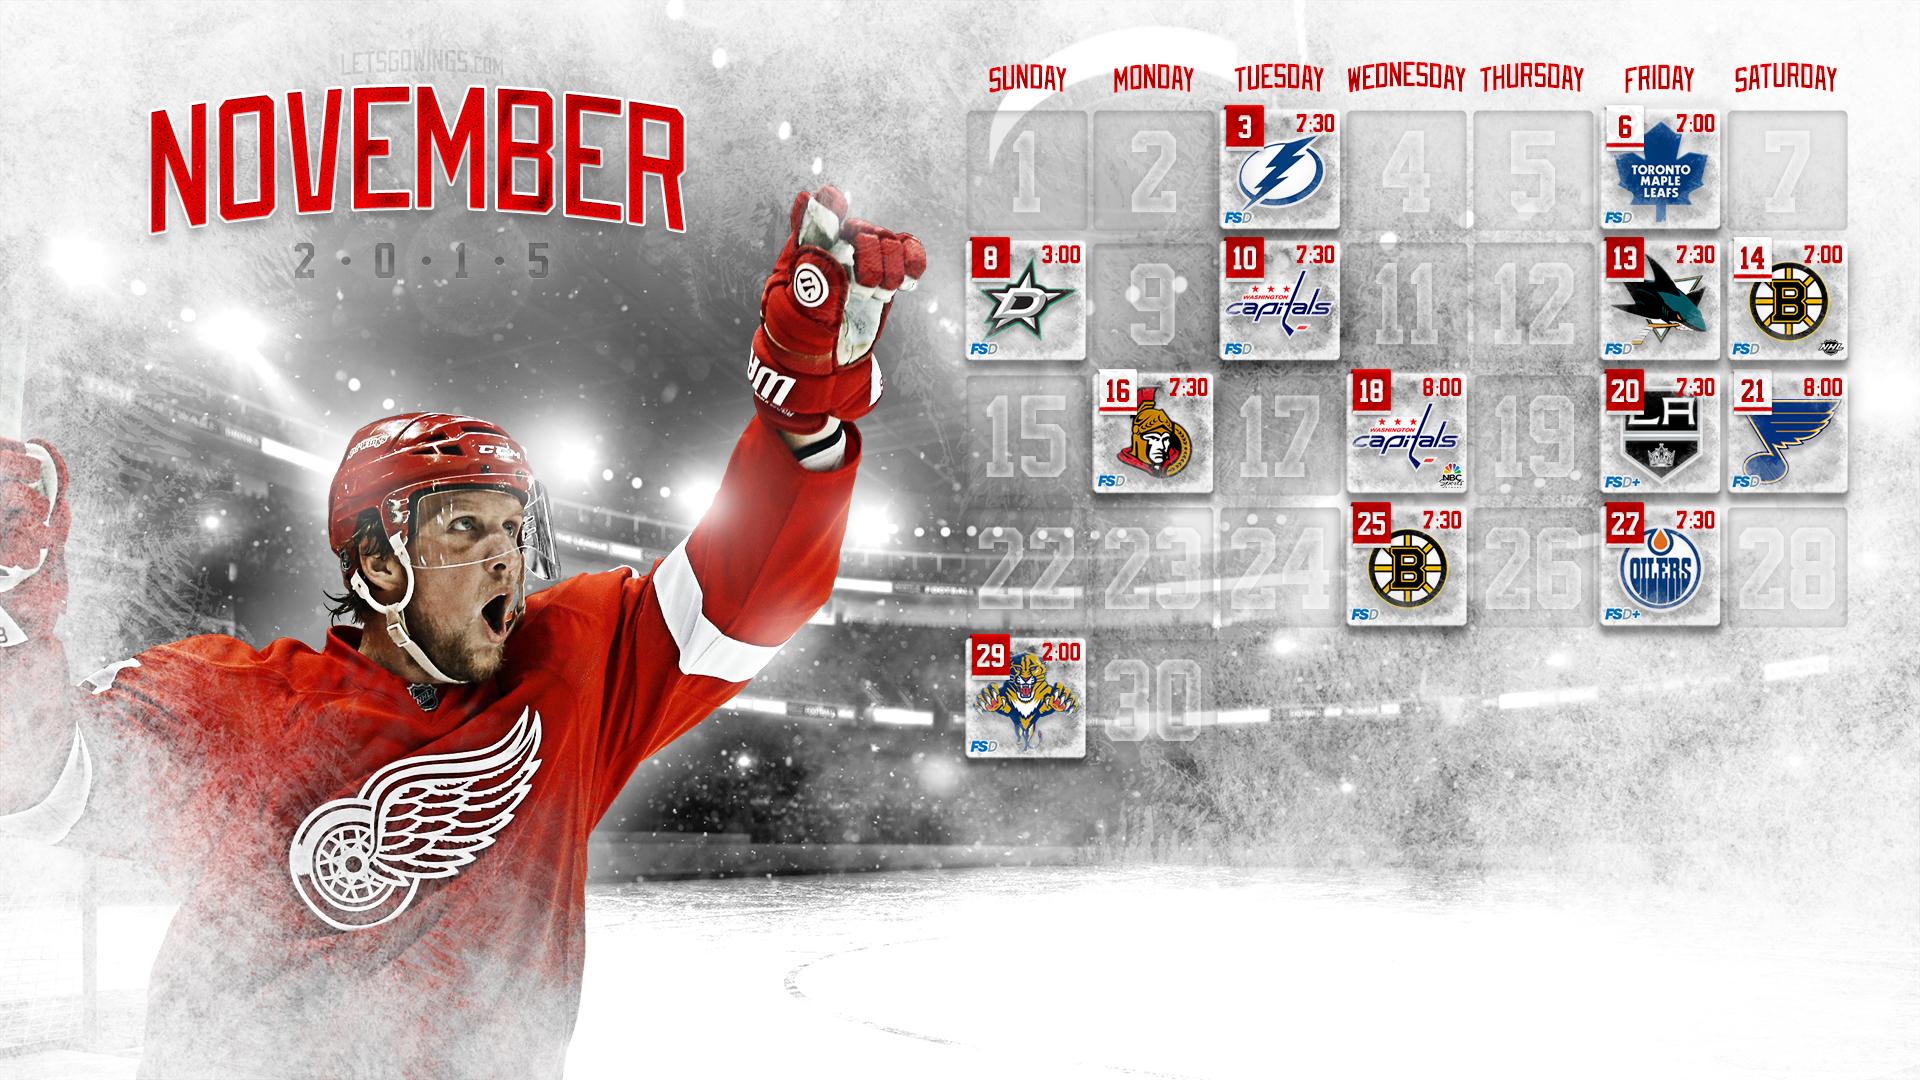 Online Calendars Metro Detroit Calendar Metro Detroit Region Michigan Naorg November 2015 Schedule Wallpaper Now Available News